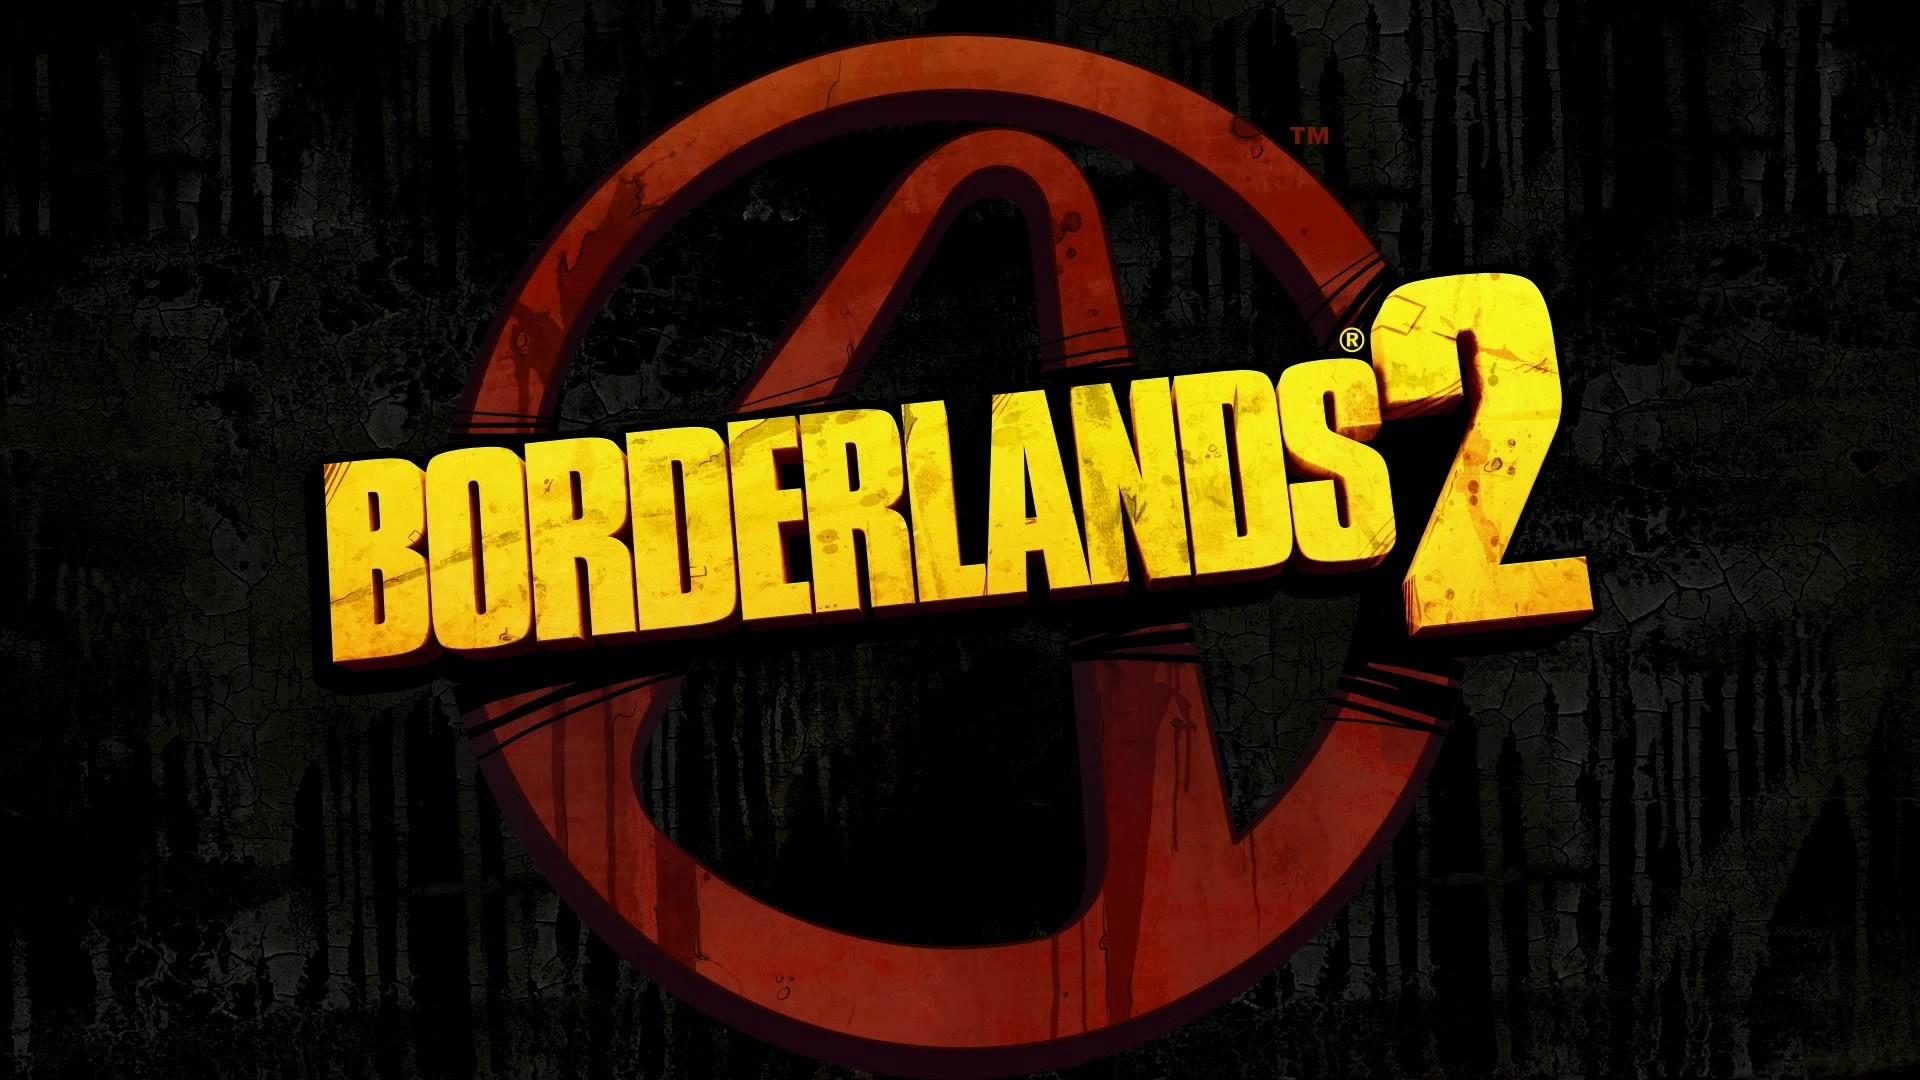 Borderlands 2 wallpaper 8